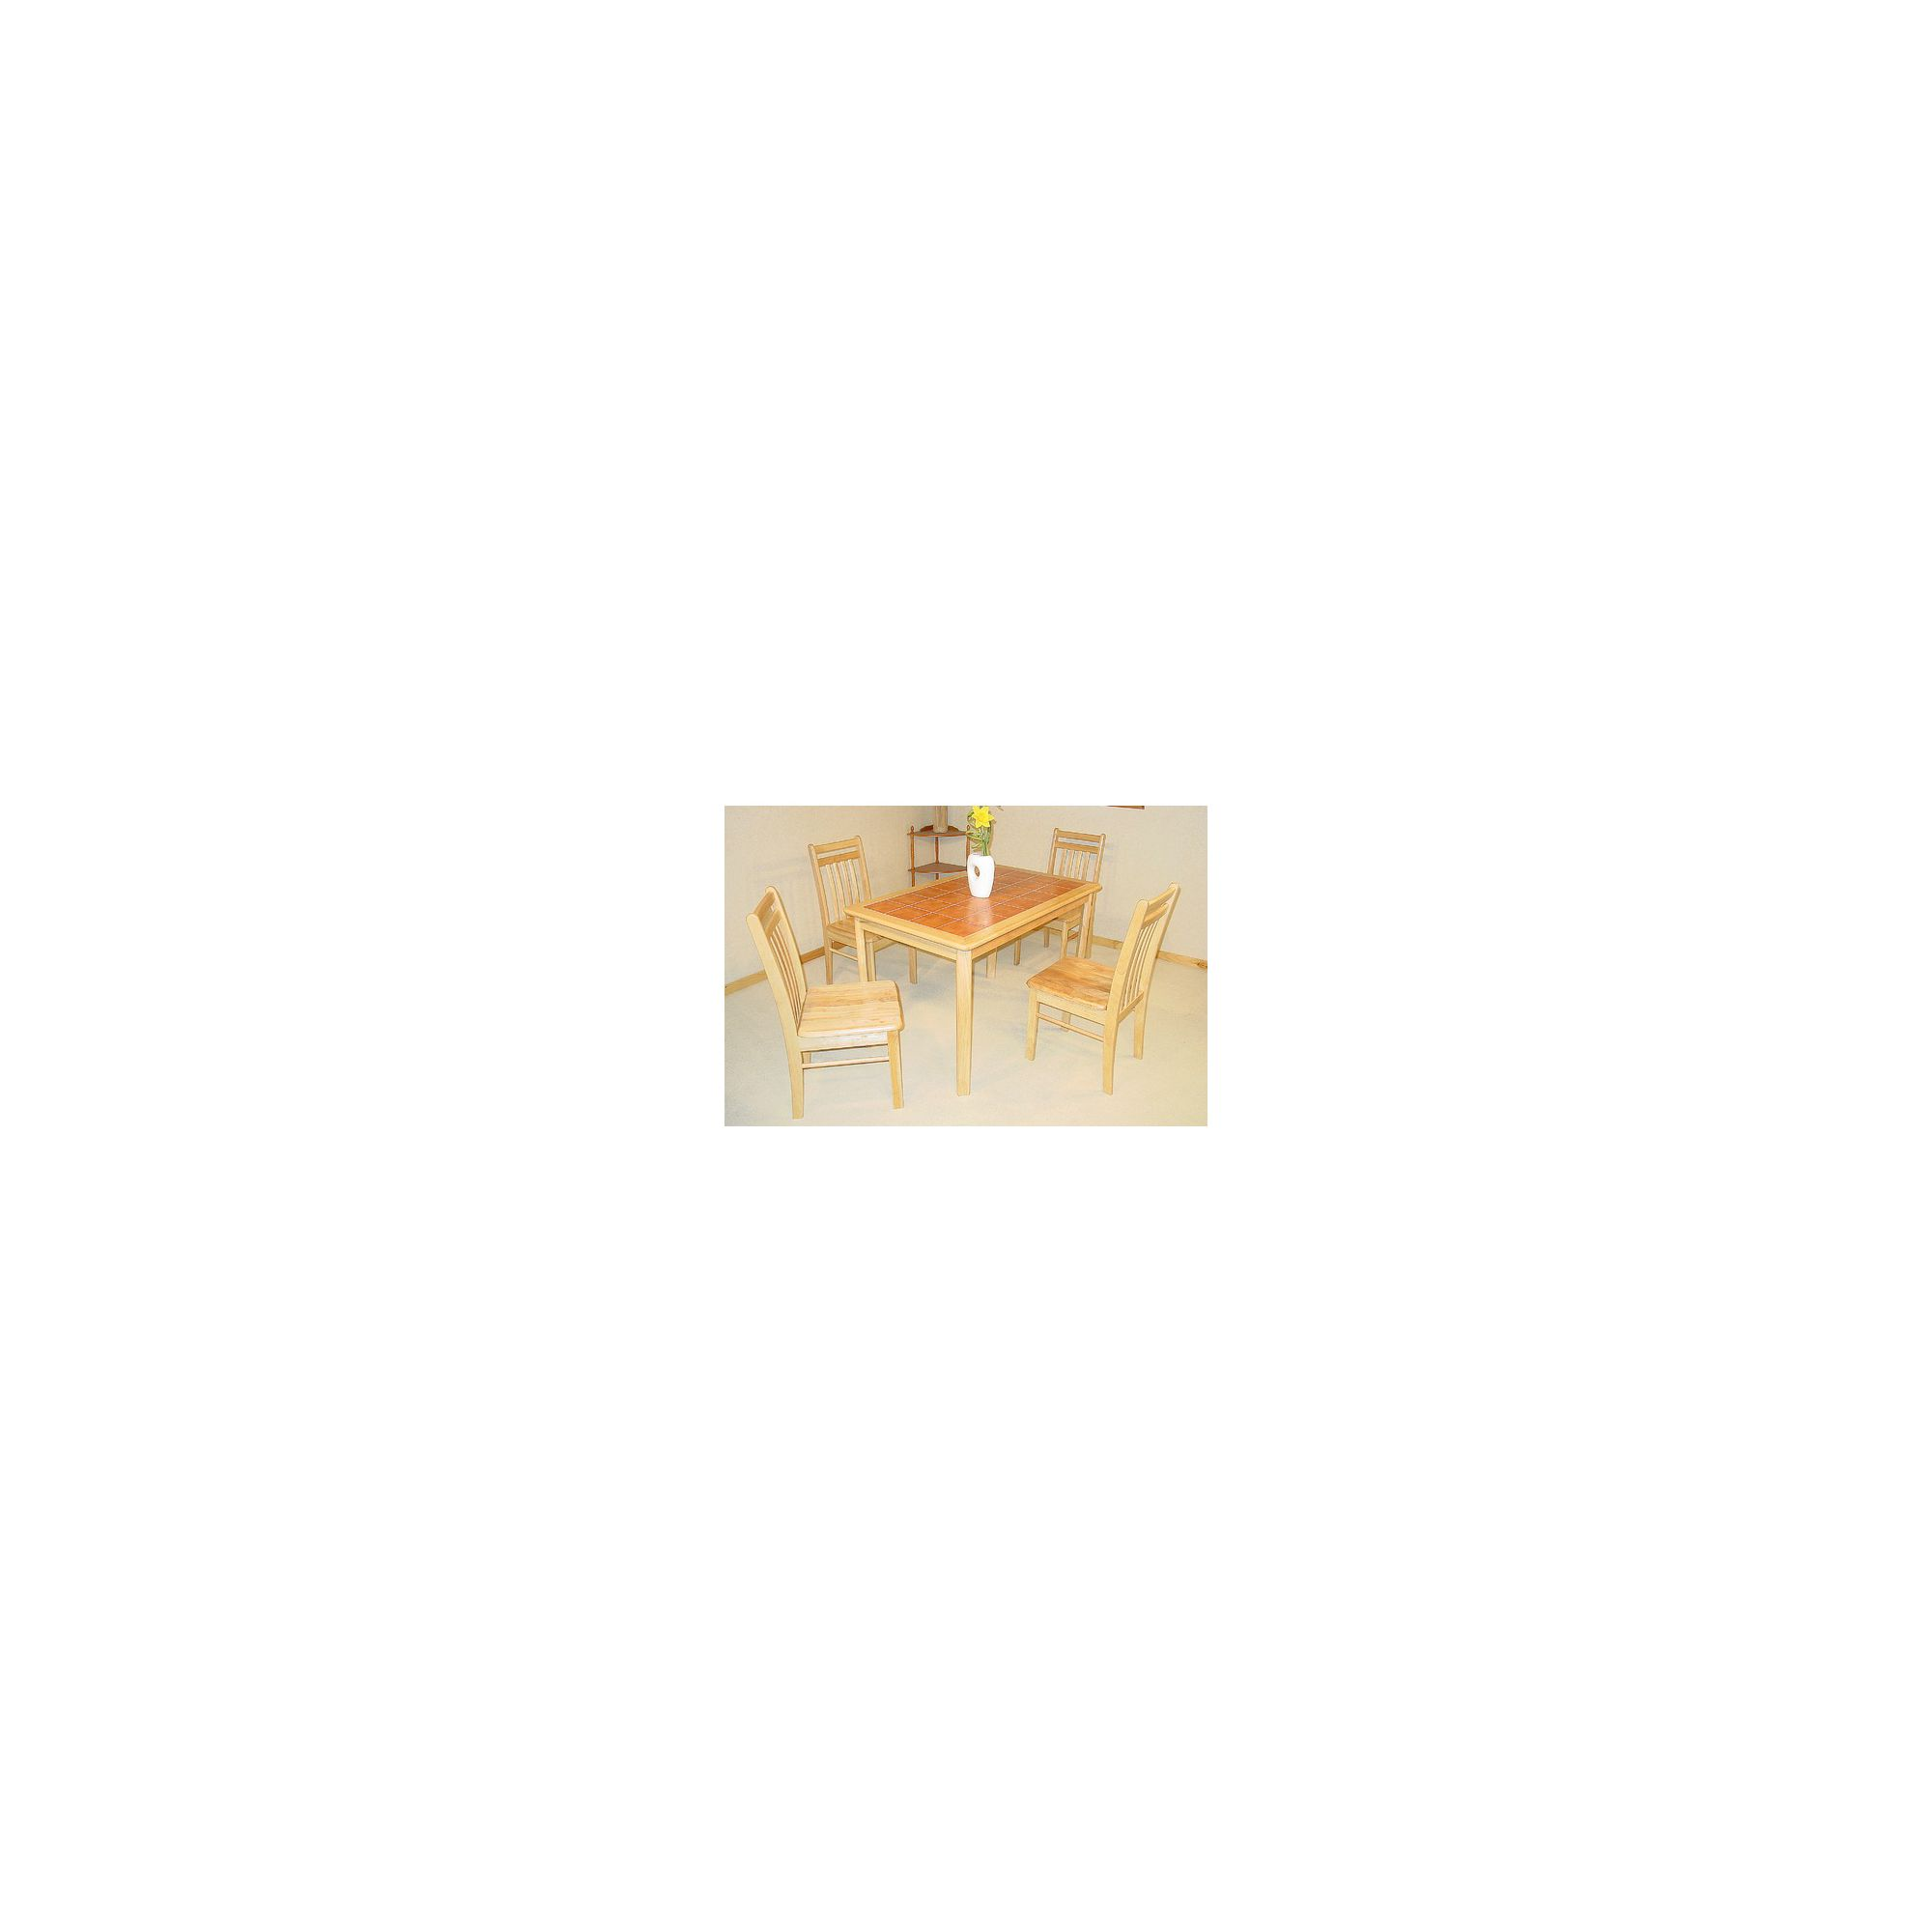 Heartlands Tiletop 5 Piece Dining Set - White at Tesco Direct